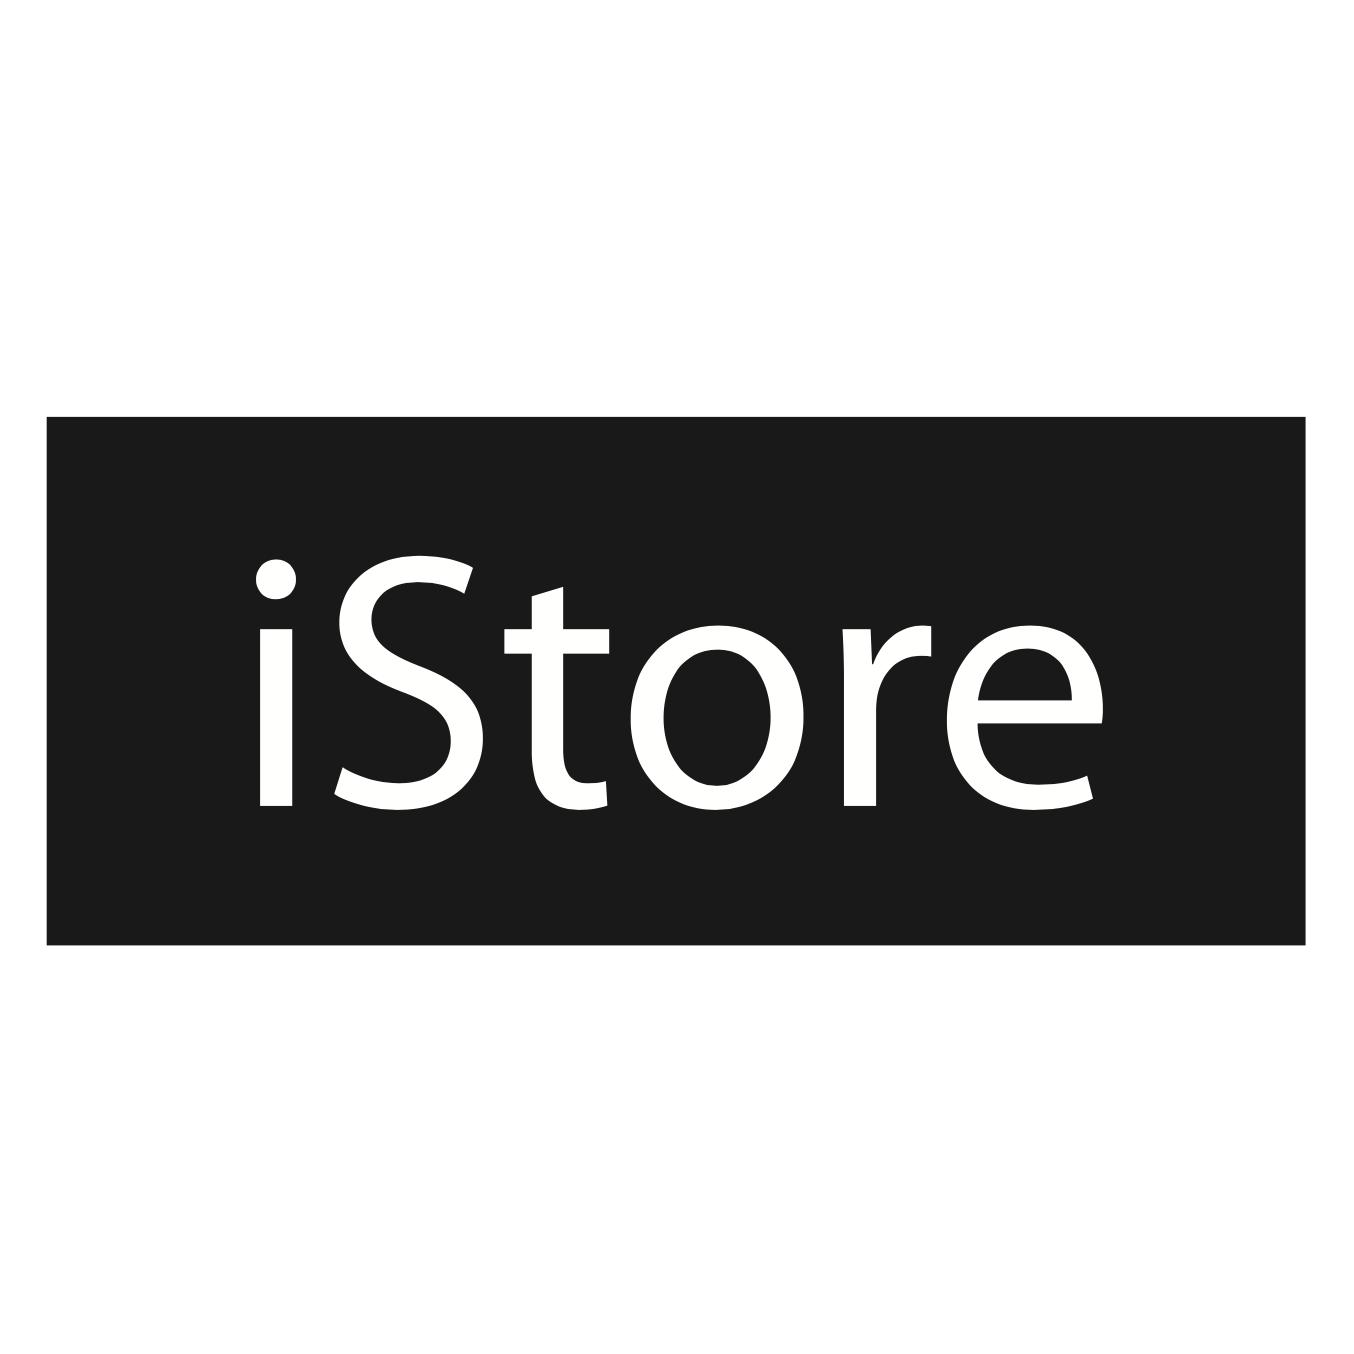 iPad mini 4 Silicone Case - Stone